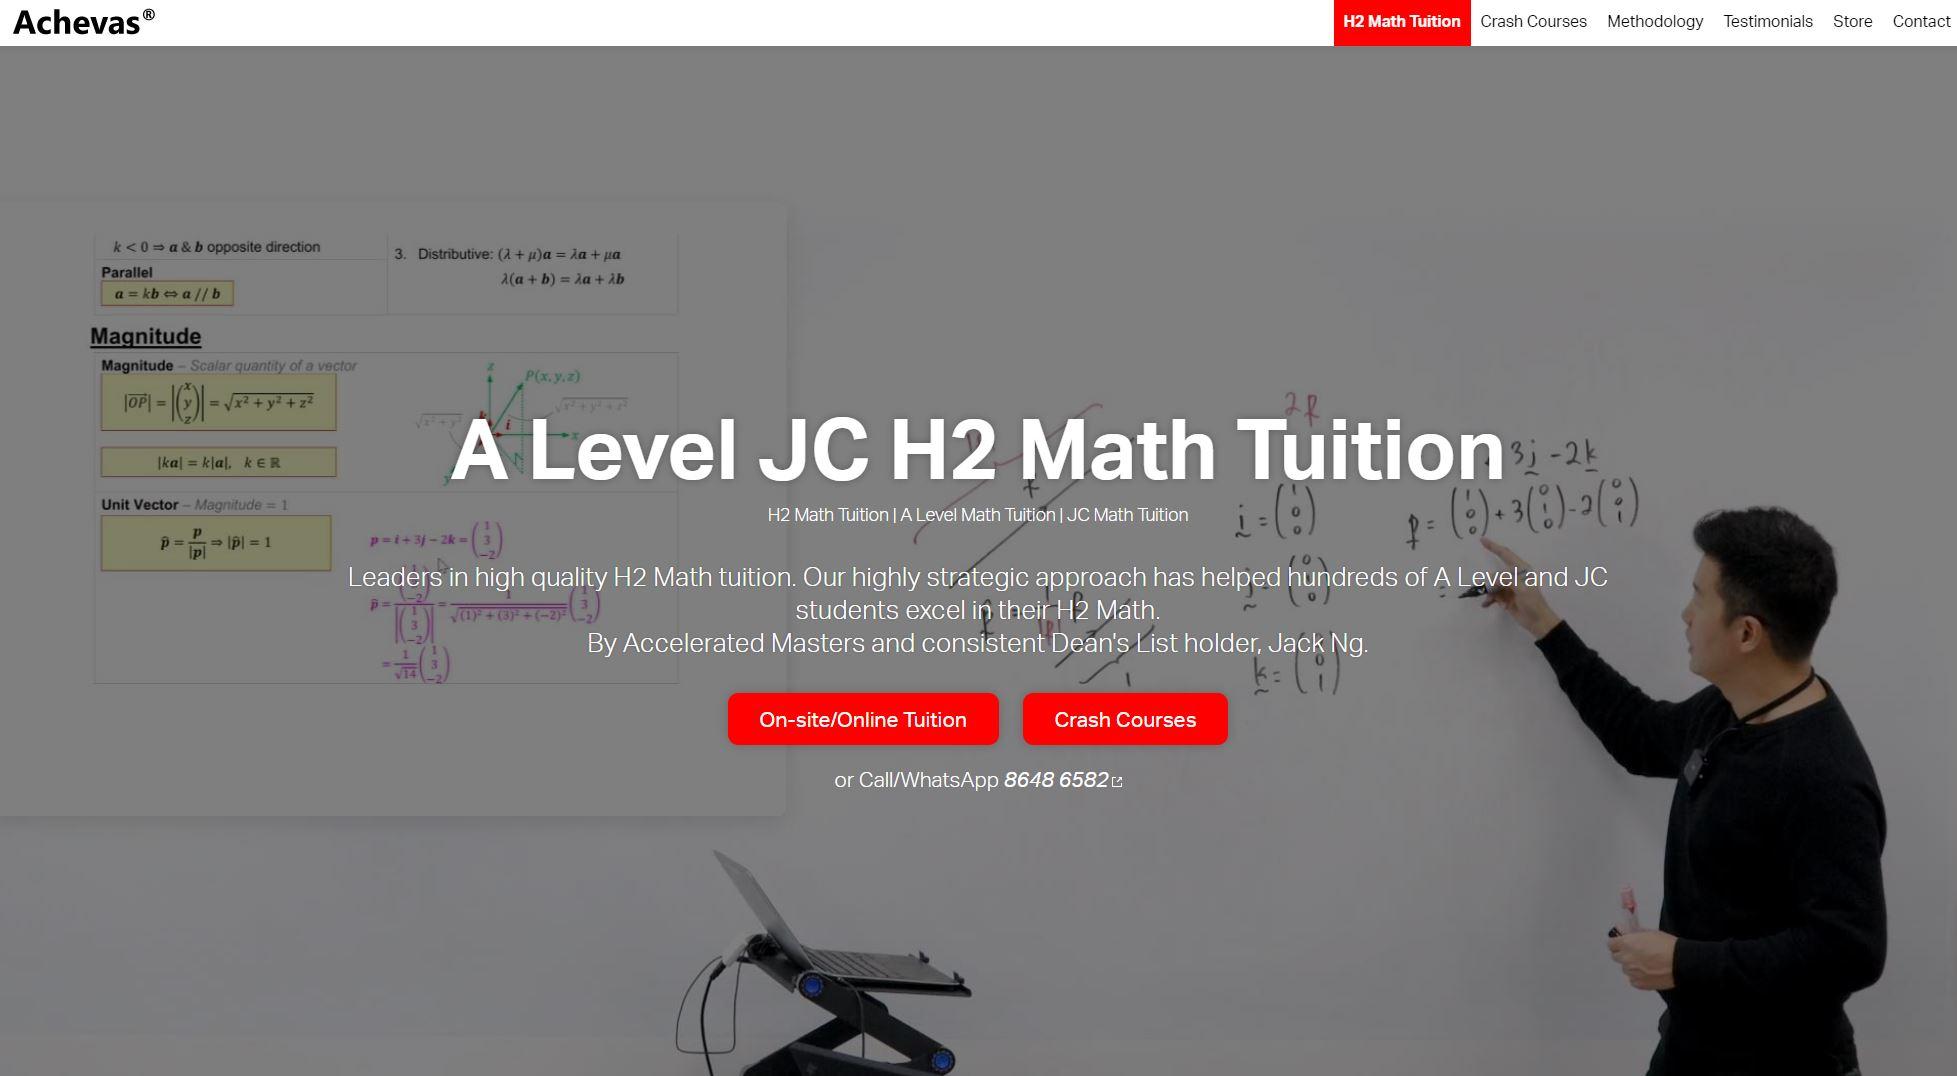 Achevas-Maths-Tuition